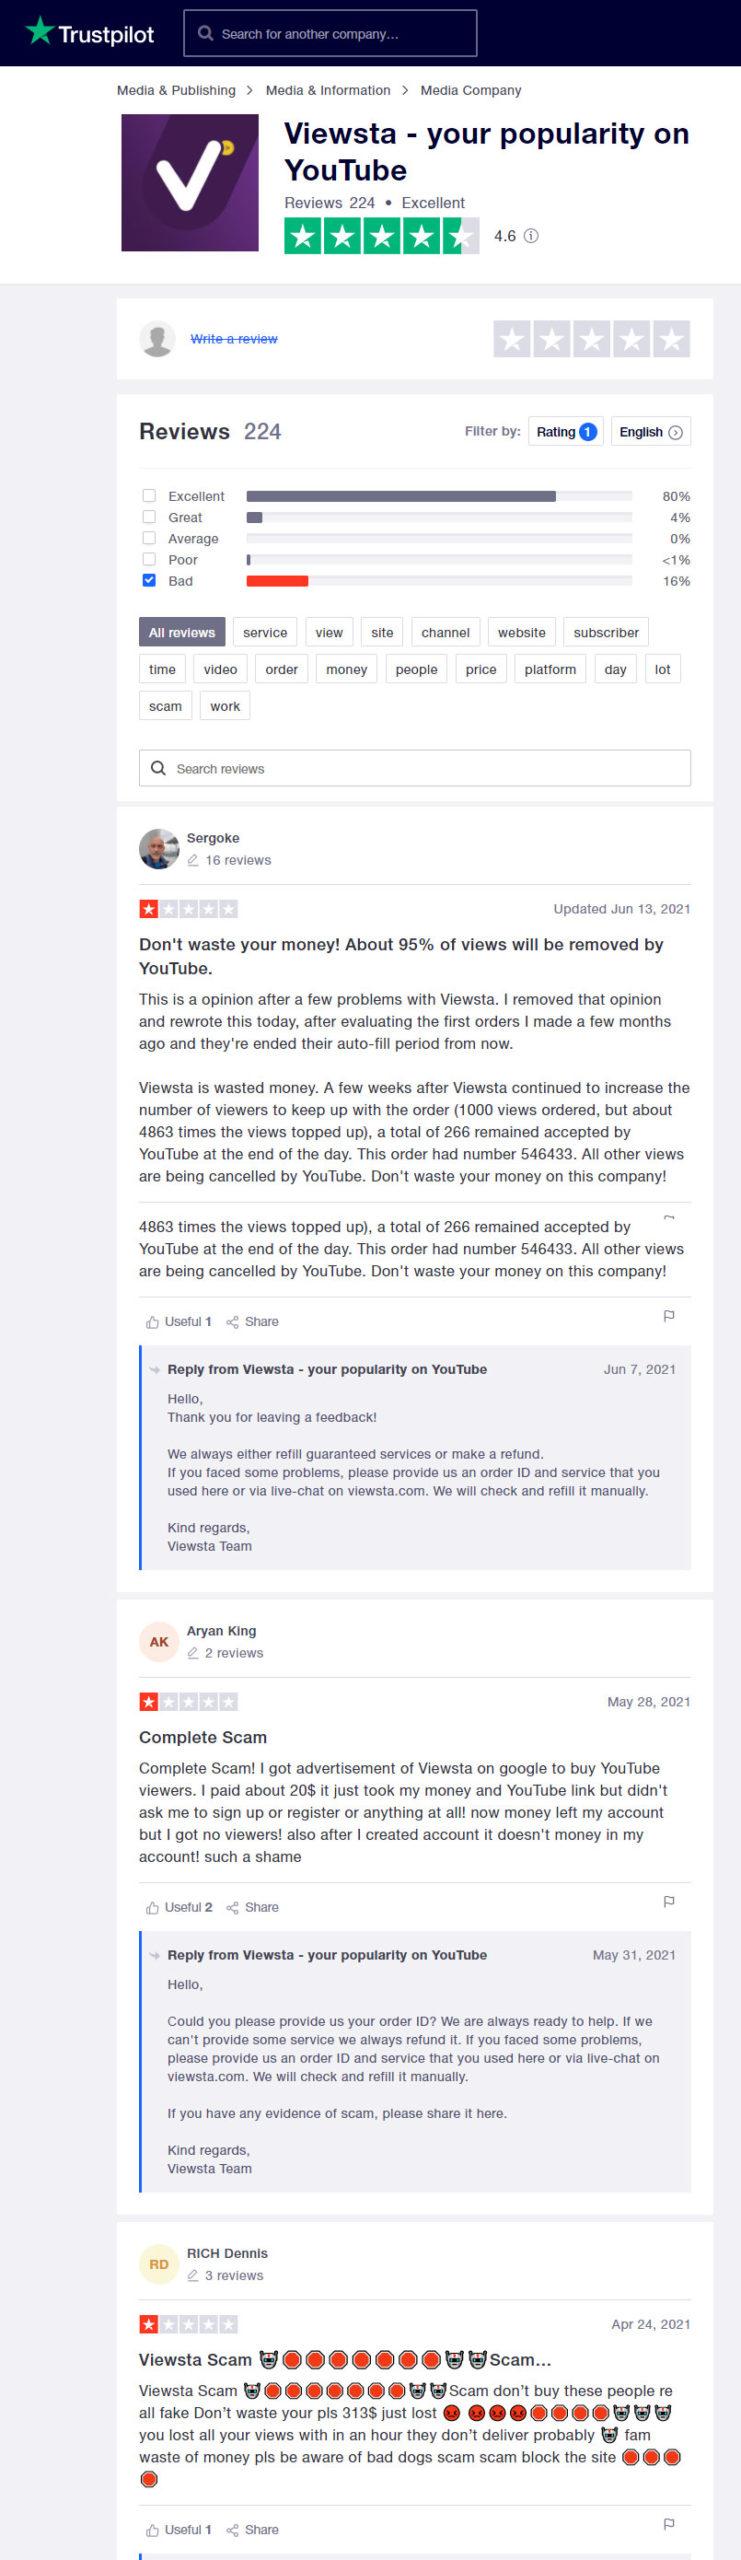 Viewsta-Trustpilot-Reviews-